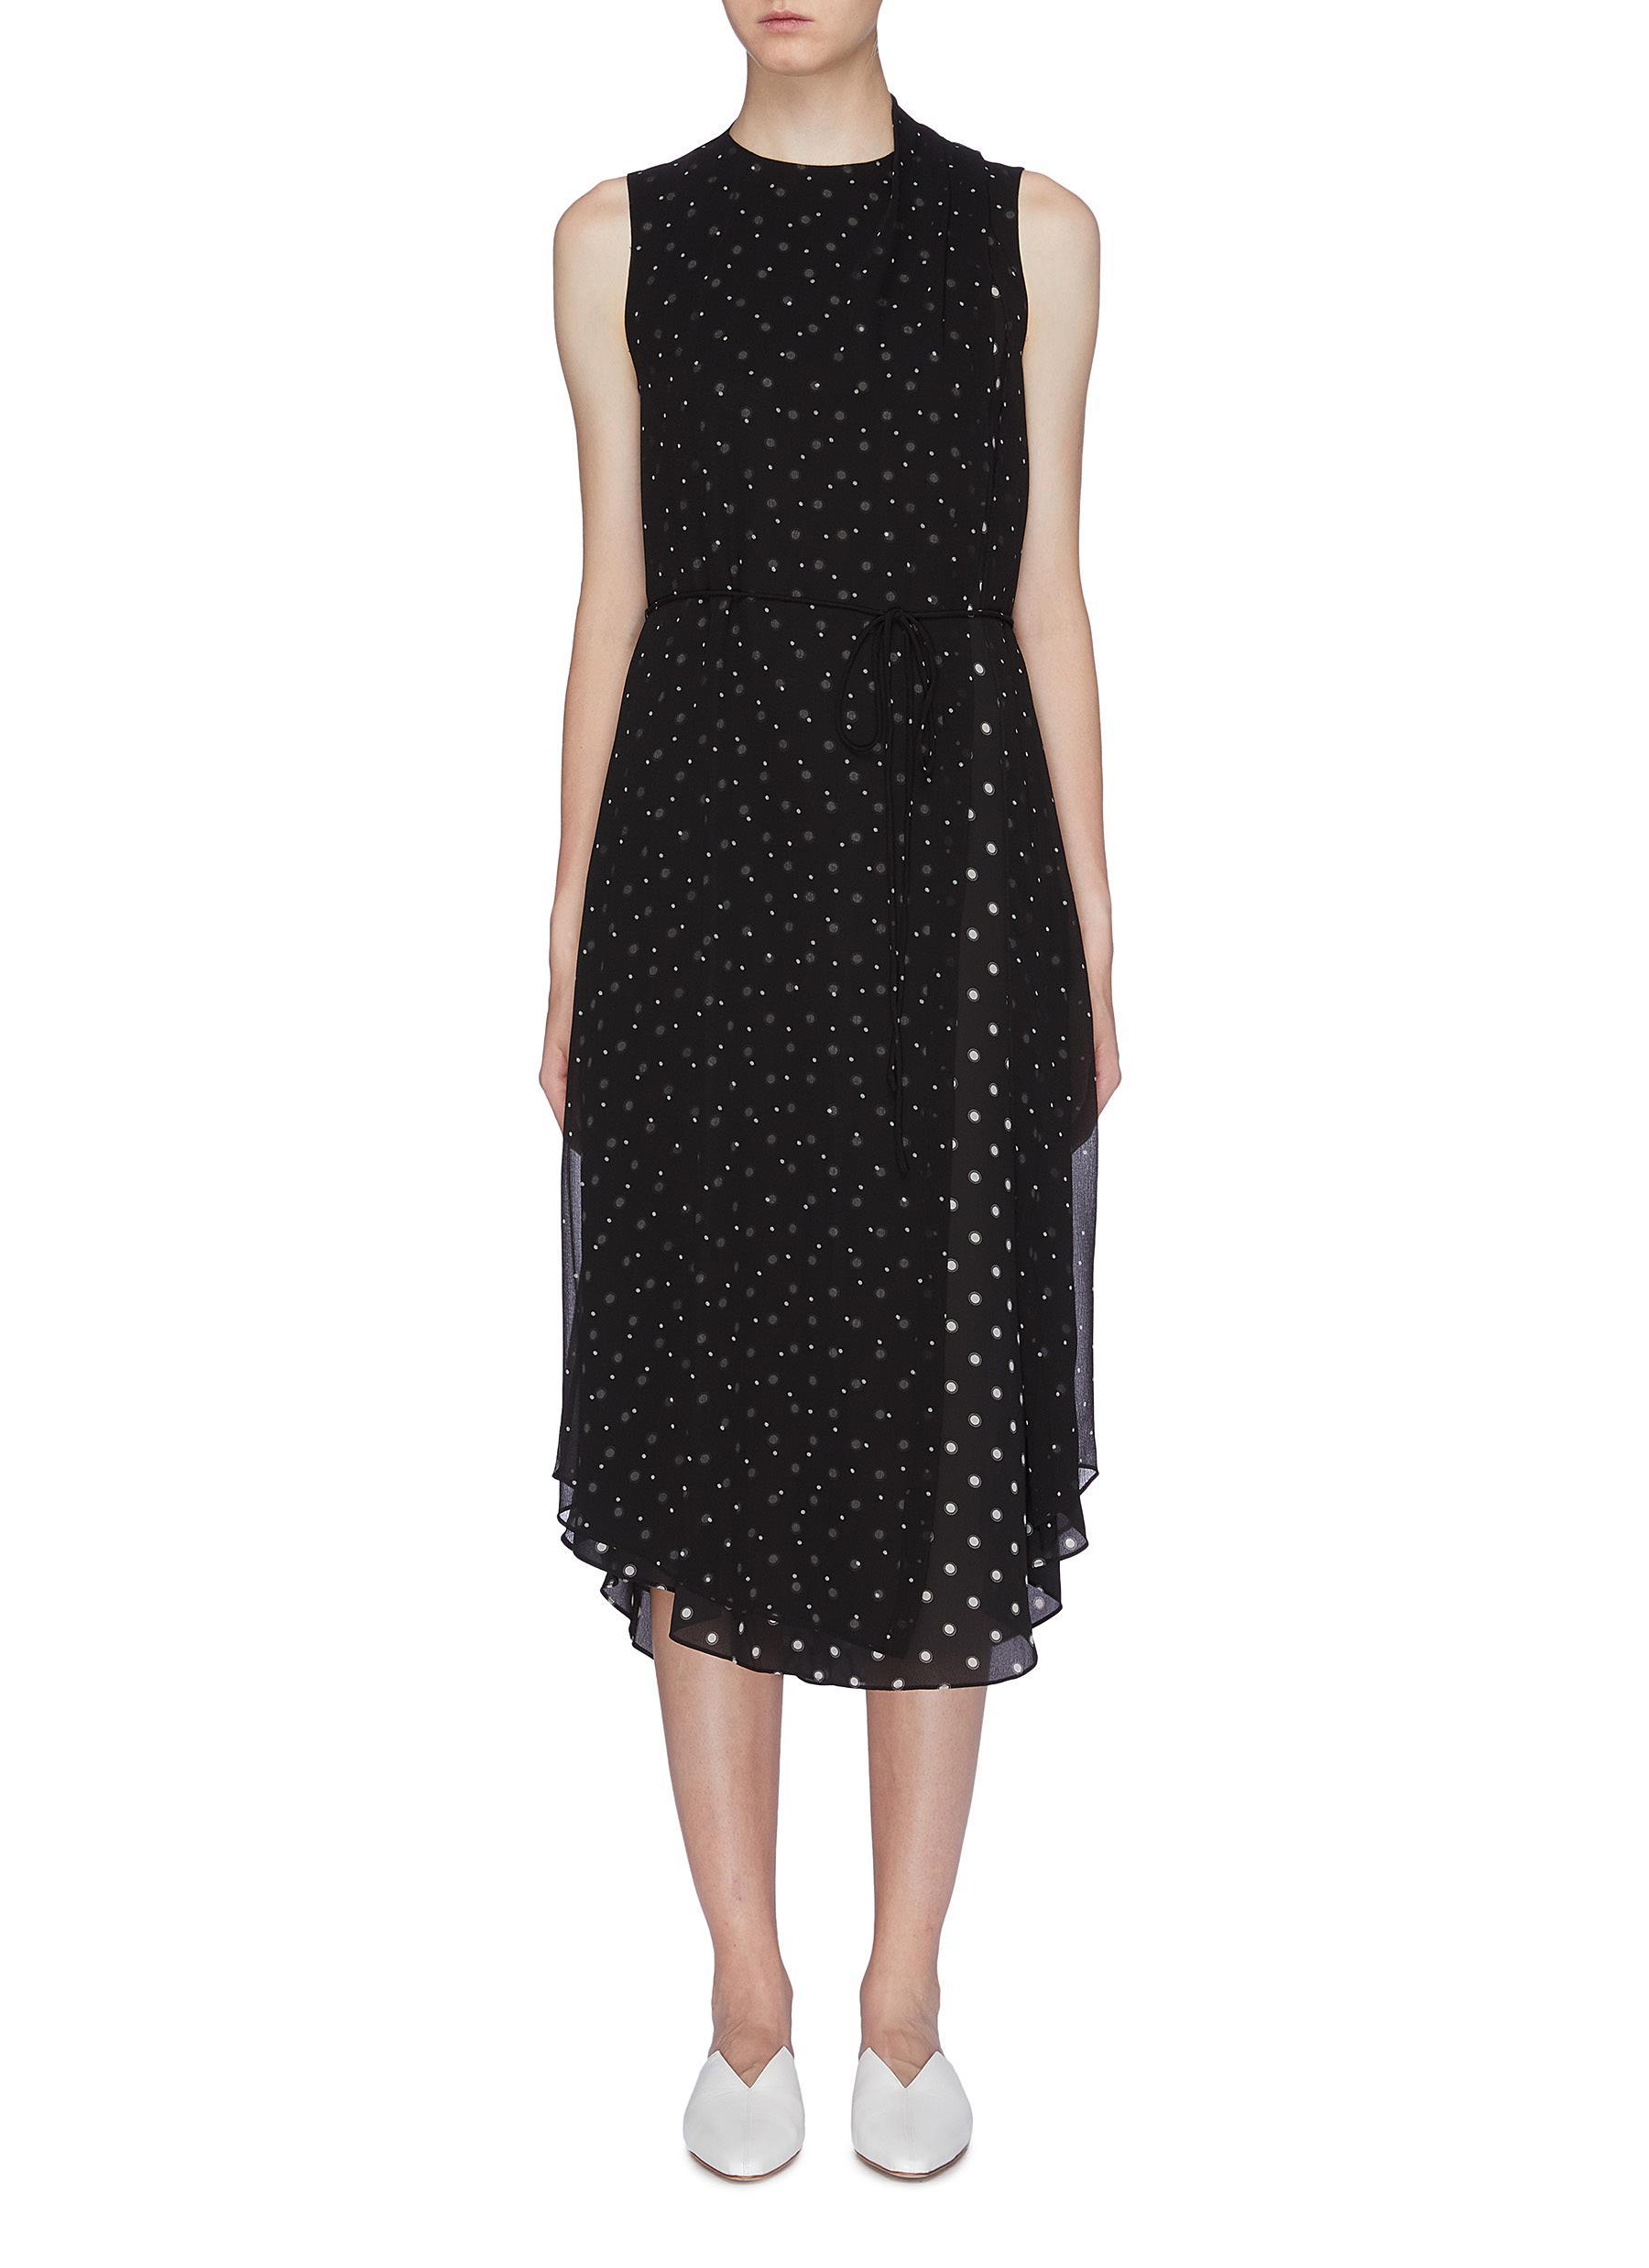 Chiffon overlay polka dot print sleeveless dress by Vince